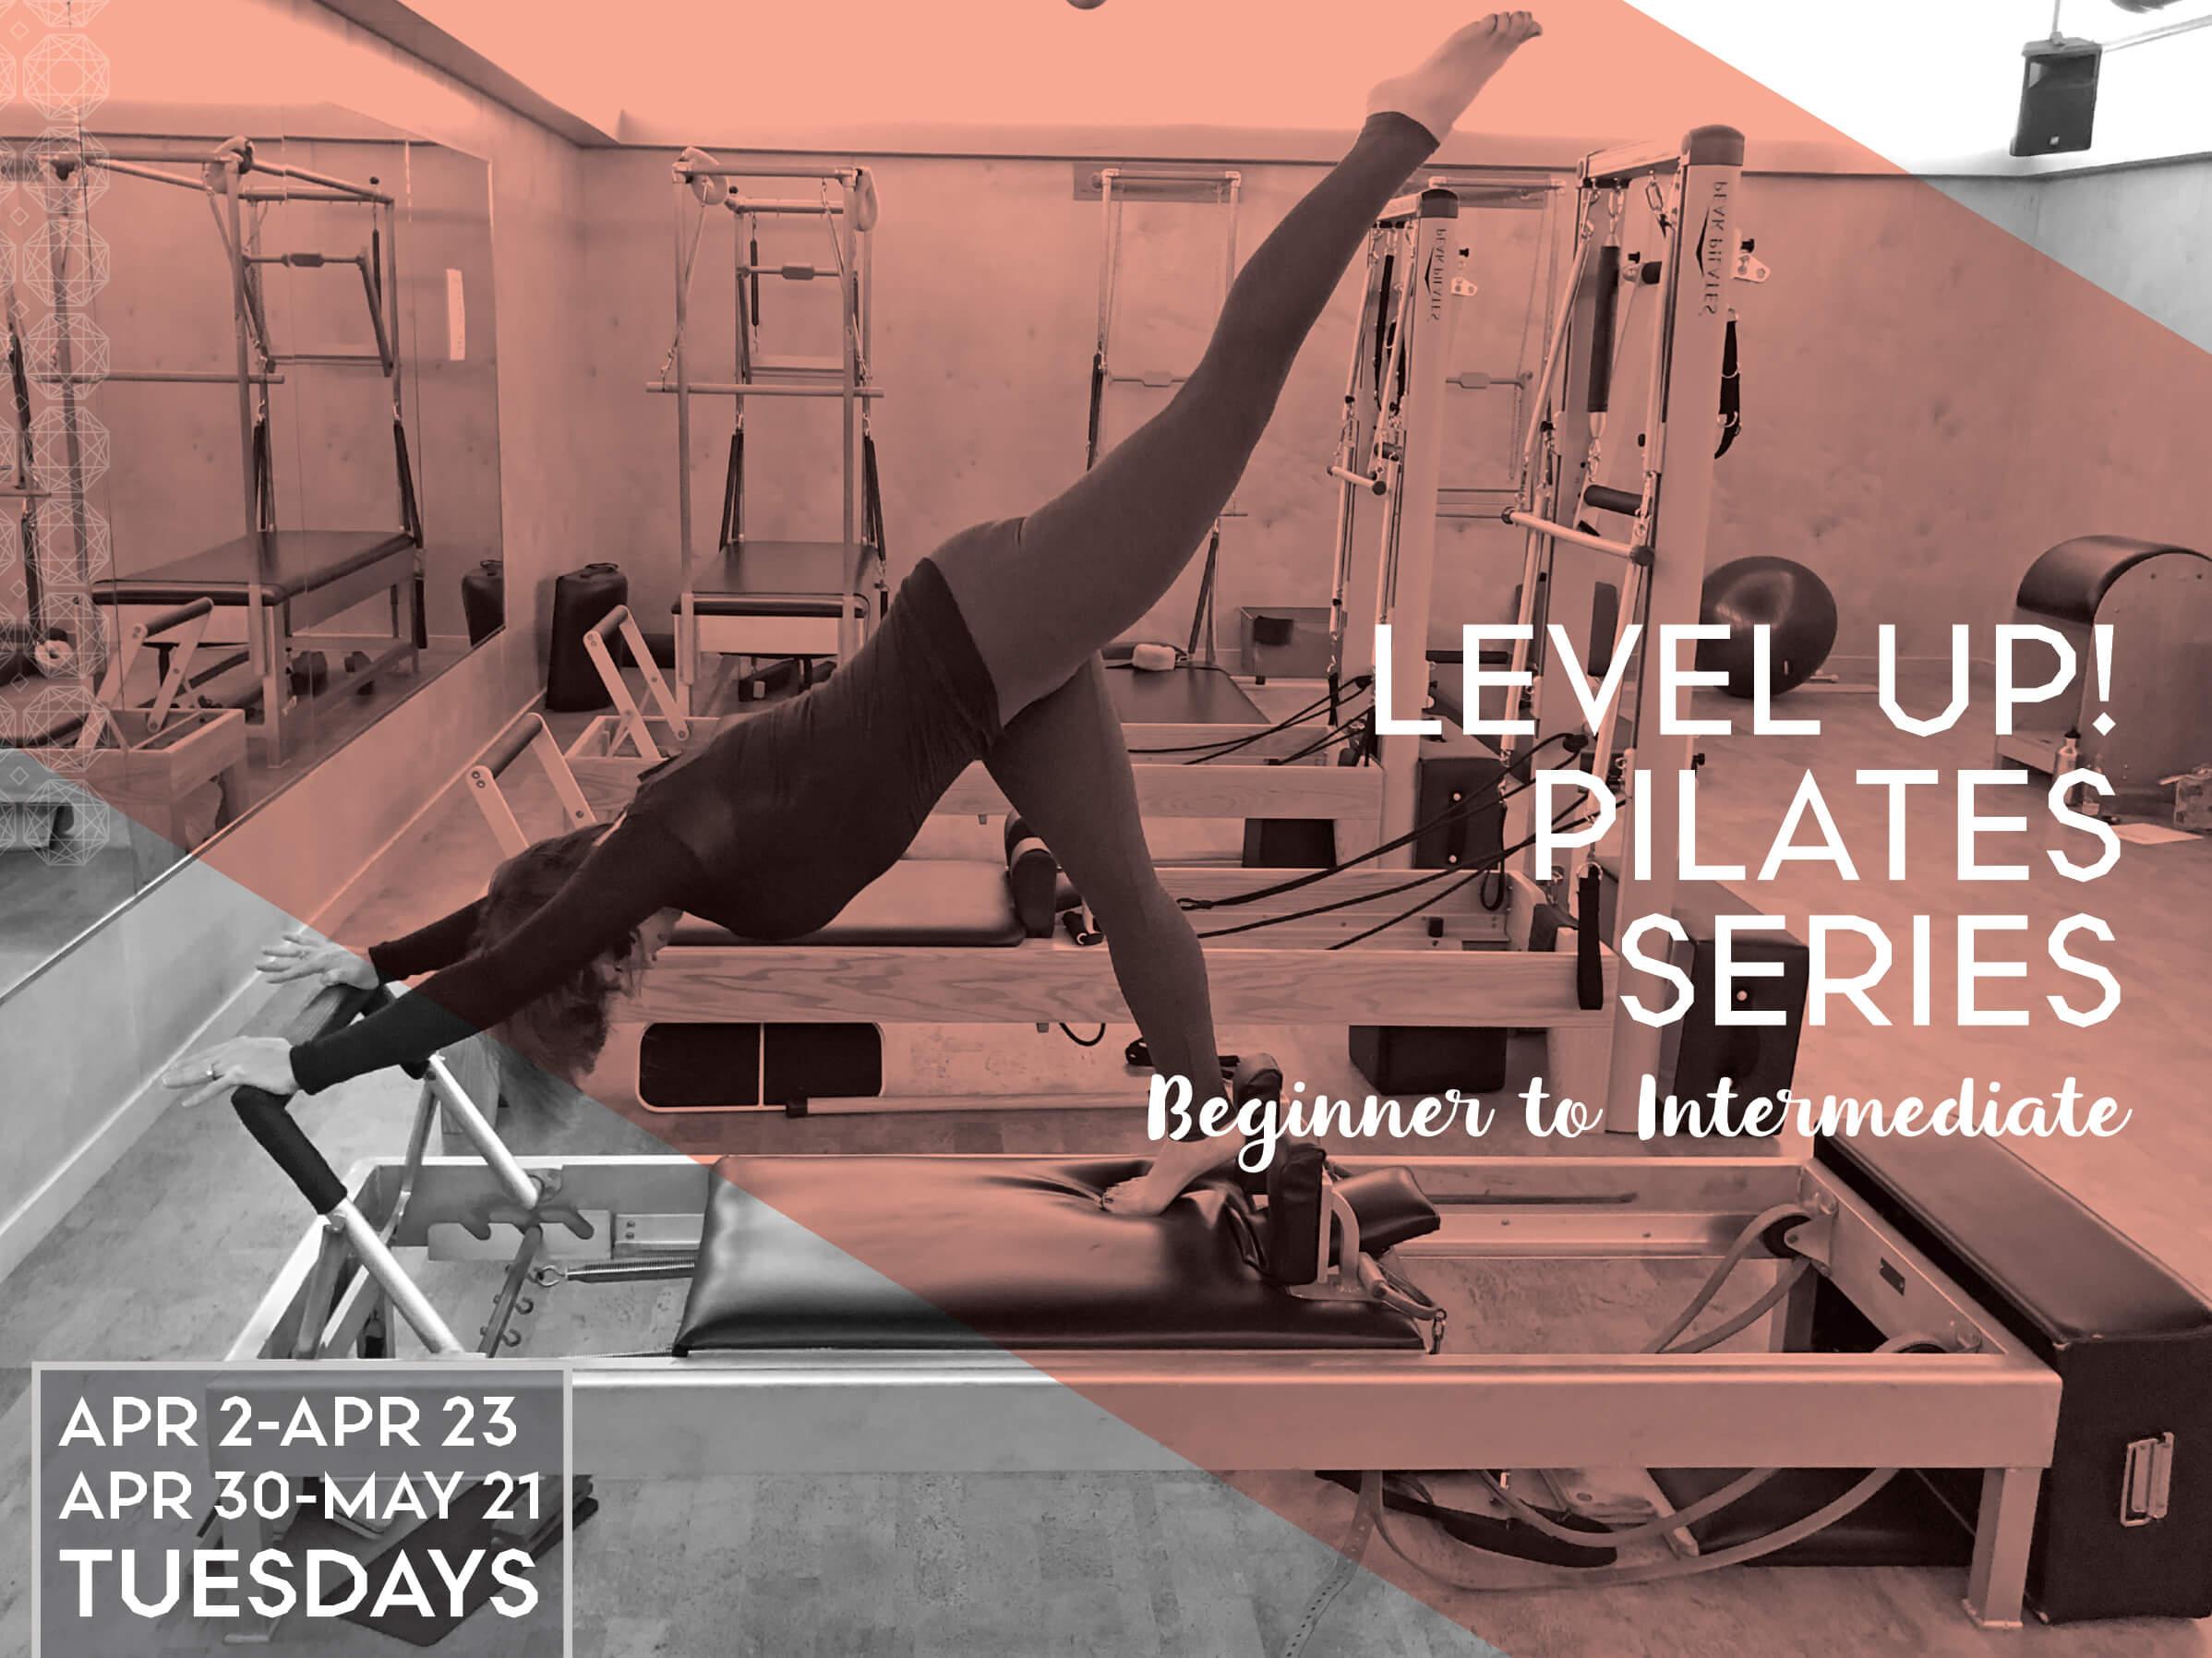 Level Up! Pilates Series